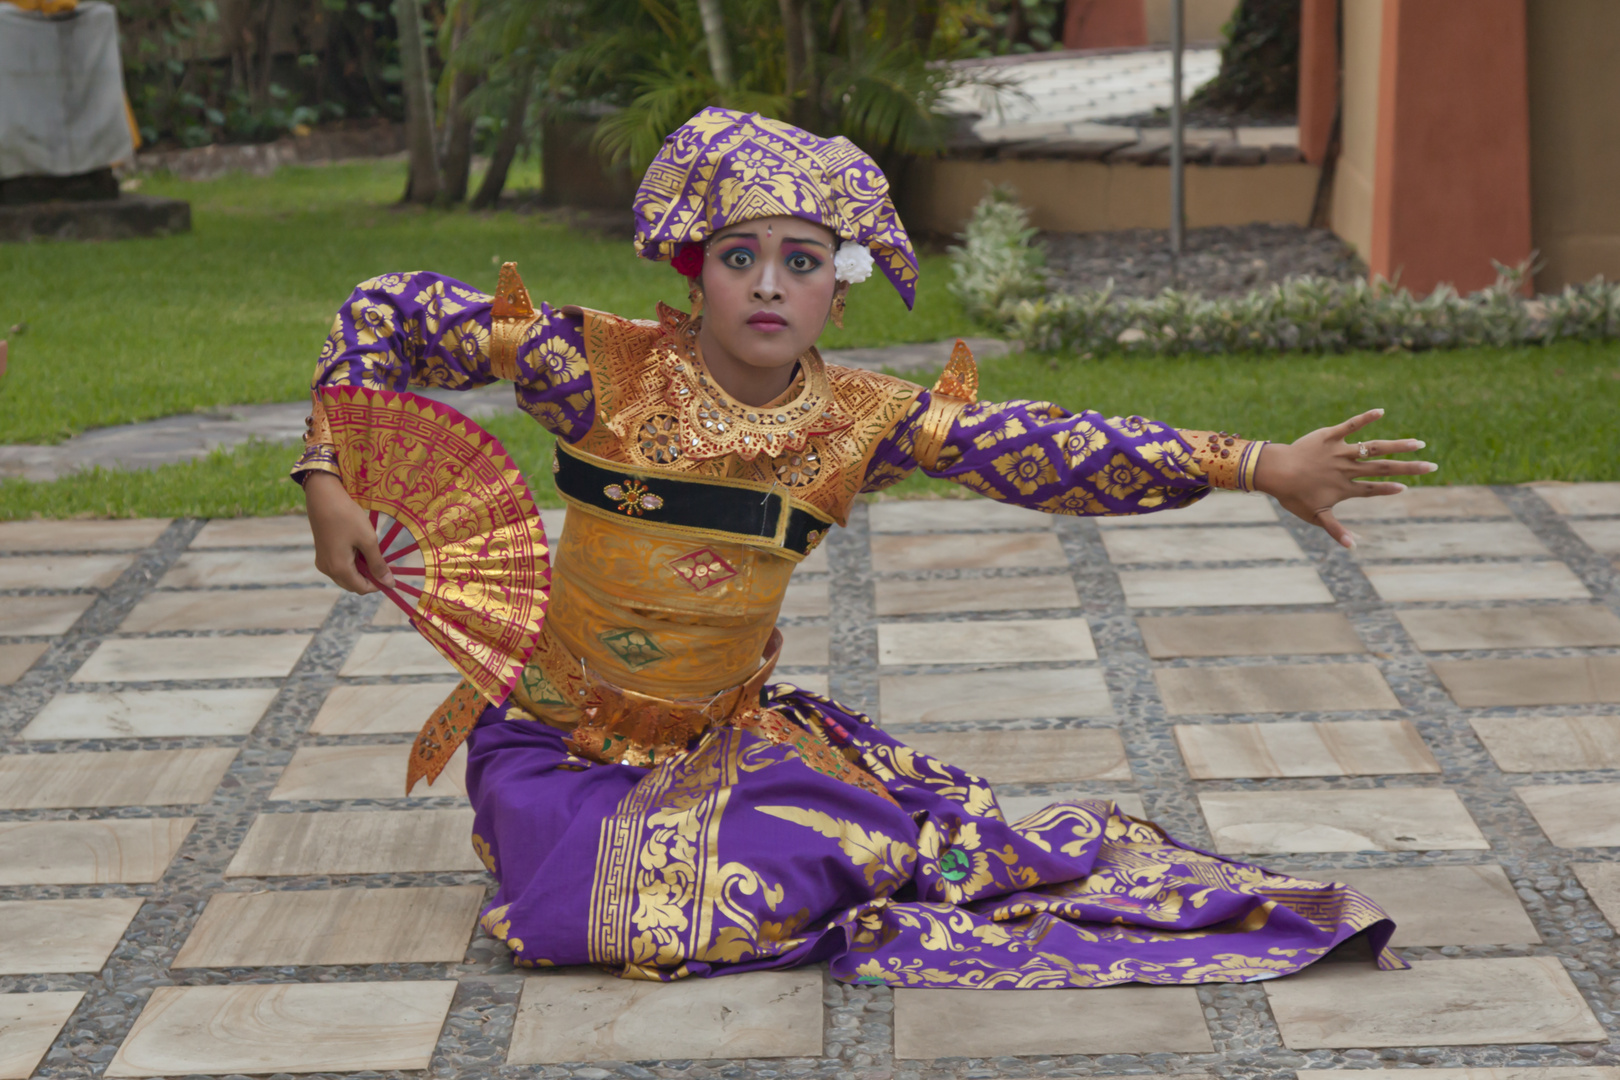 Balinesischer Tanz (5)